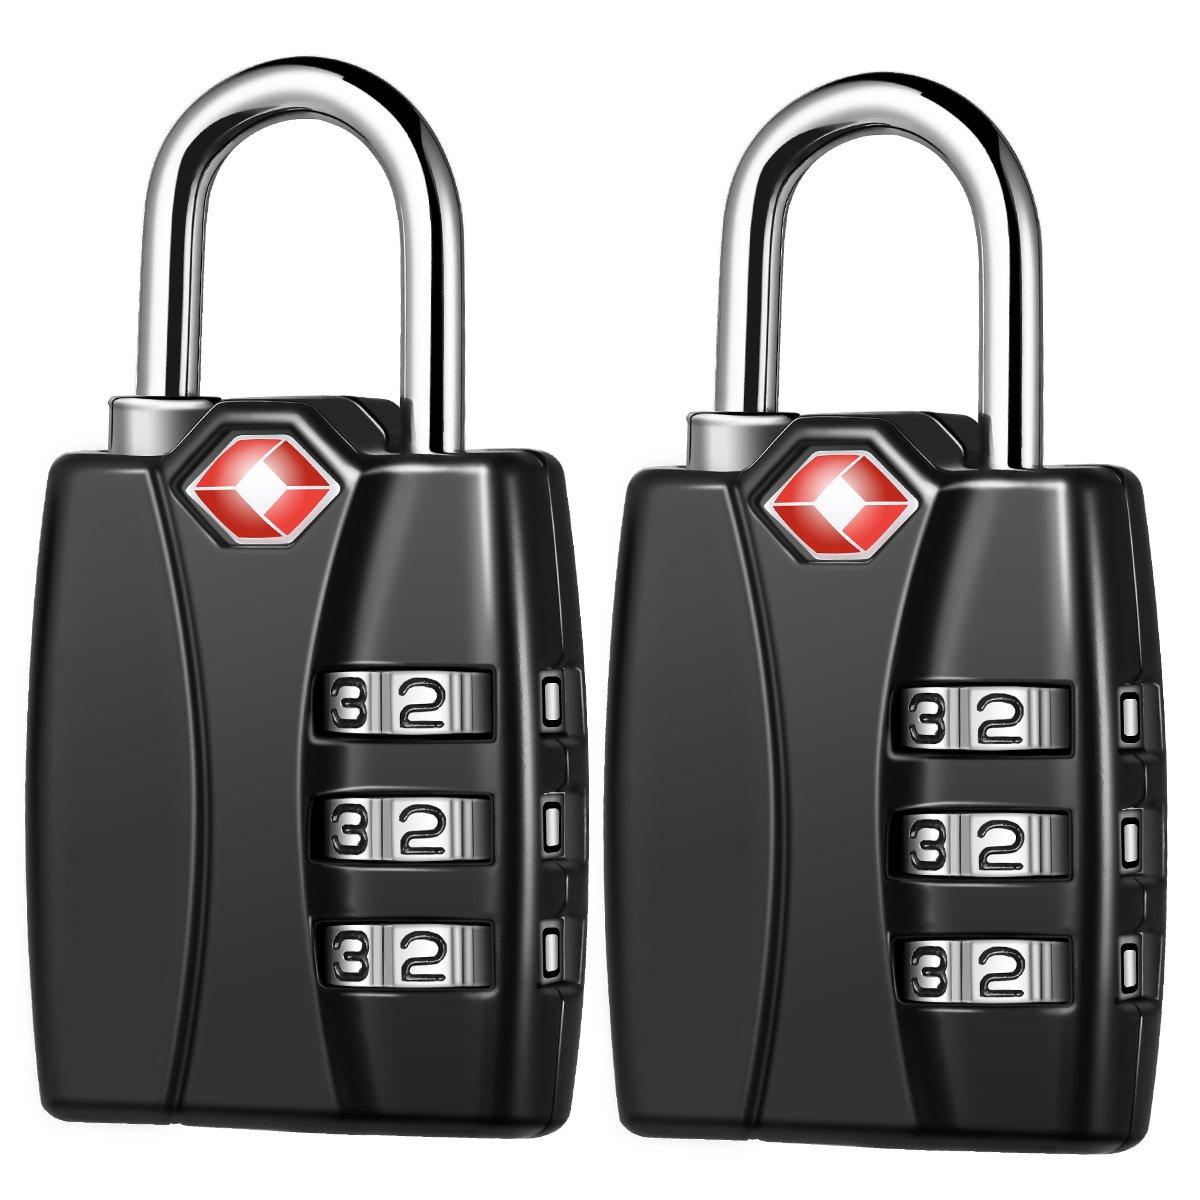 KeeKit Combination Locks, TSA Approved Luggage Locks with Open Alert Indicator, TSA Luggage Locks for Travel, Suitcase, Baggage & Backpack, Gym Locker (Black, 2 Pack) by KeeKit (Image #1)